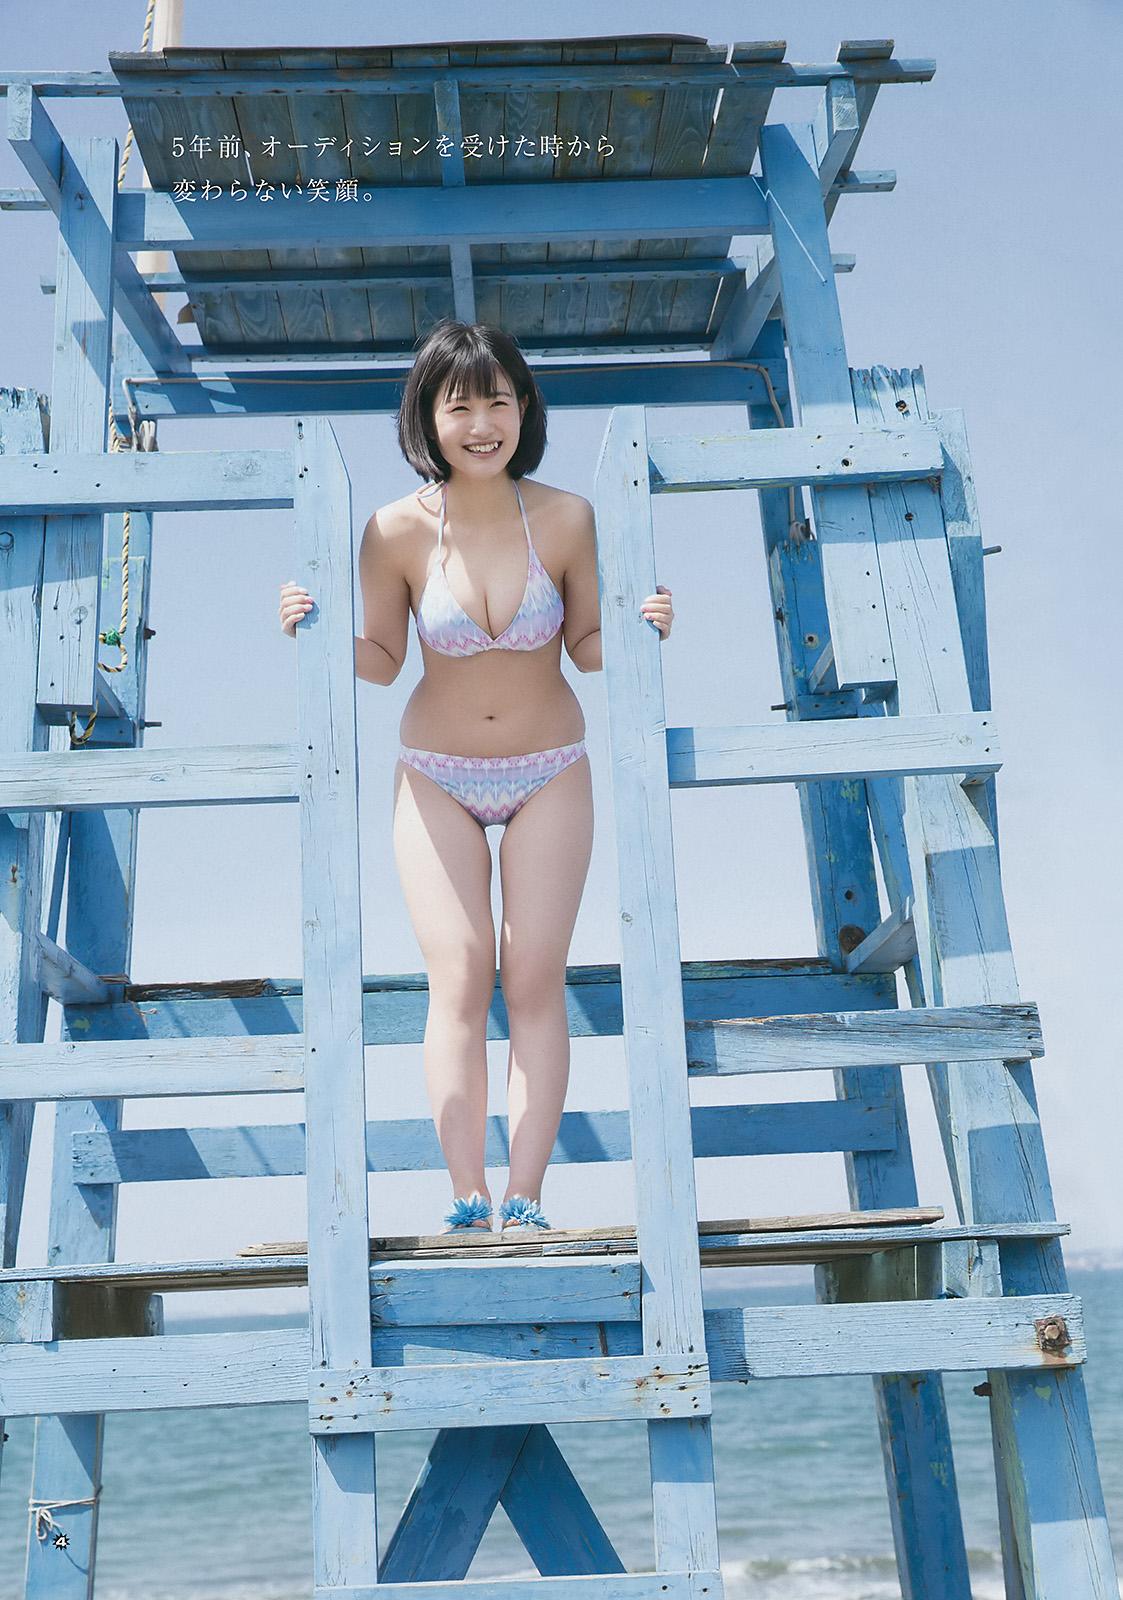 HKT48朝長美桜(19)の水着グラビア、キャバ嬢姿のエロ画像50枚・34枚目の画像